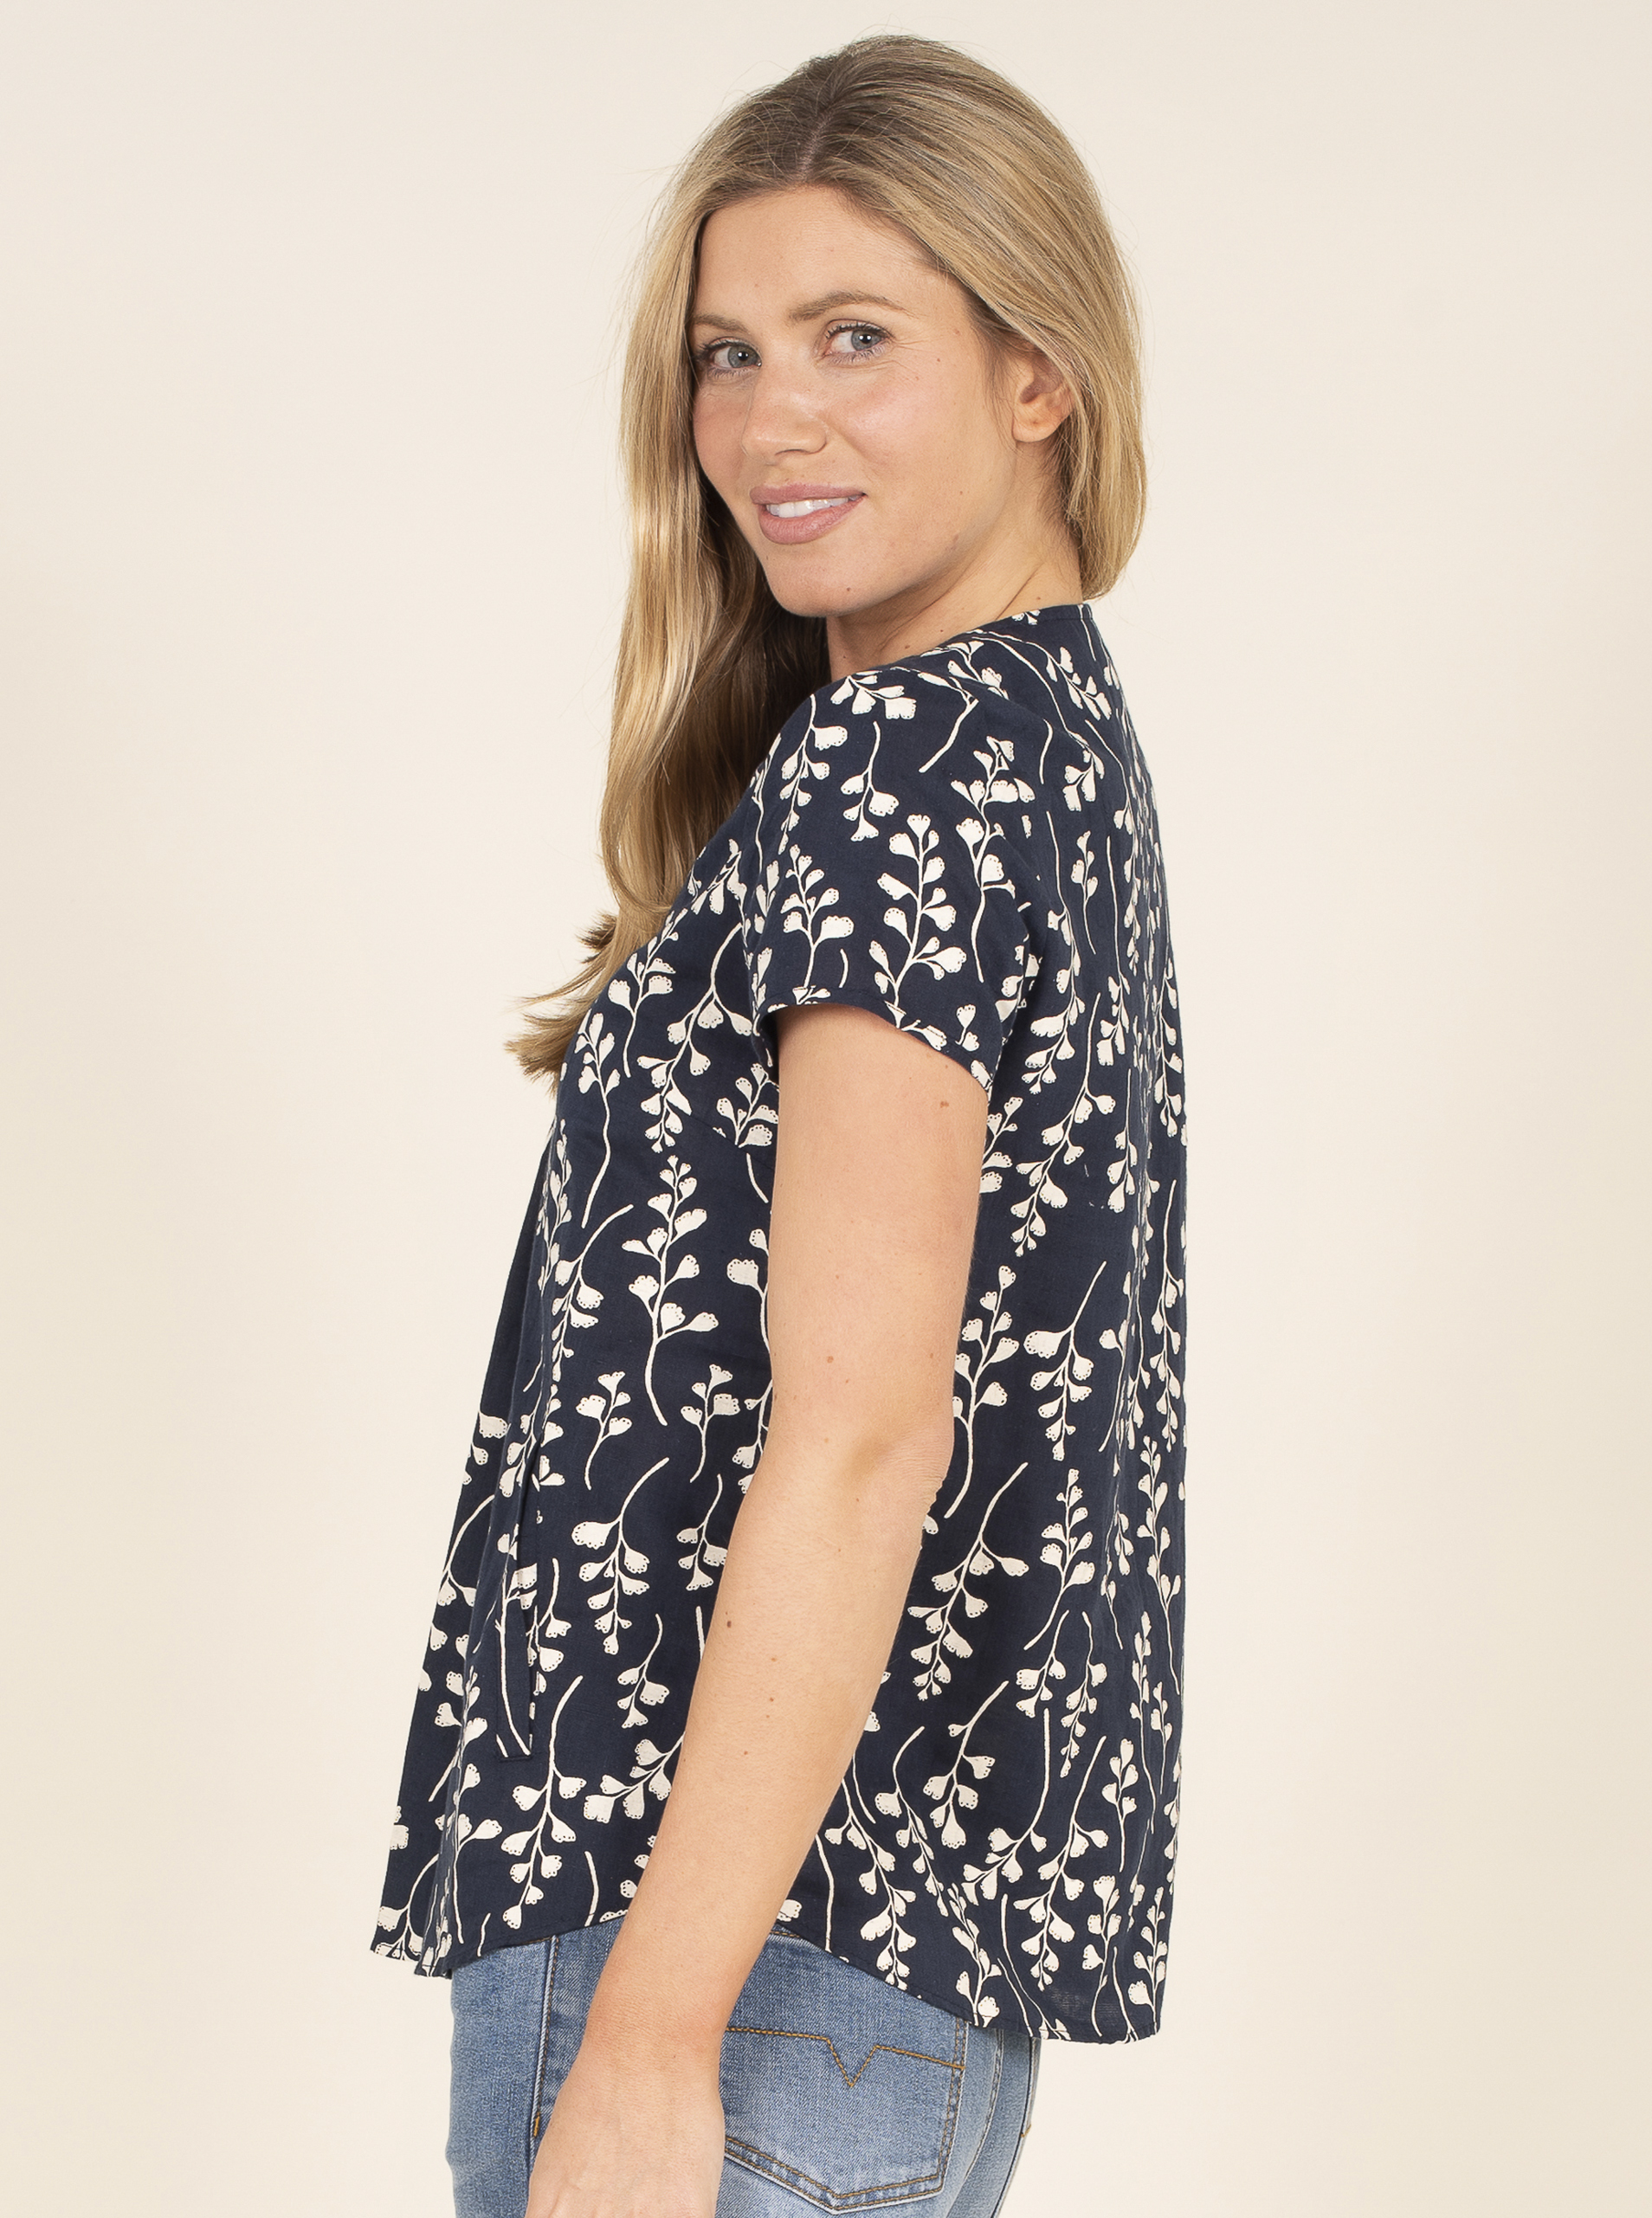 Brakeburn blouse with floral motif